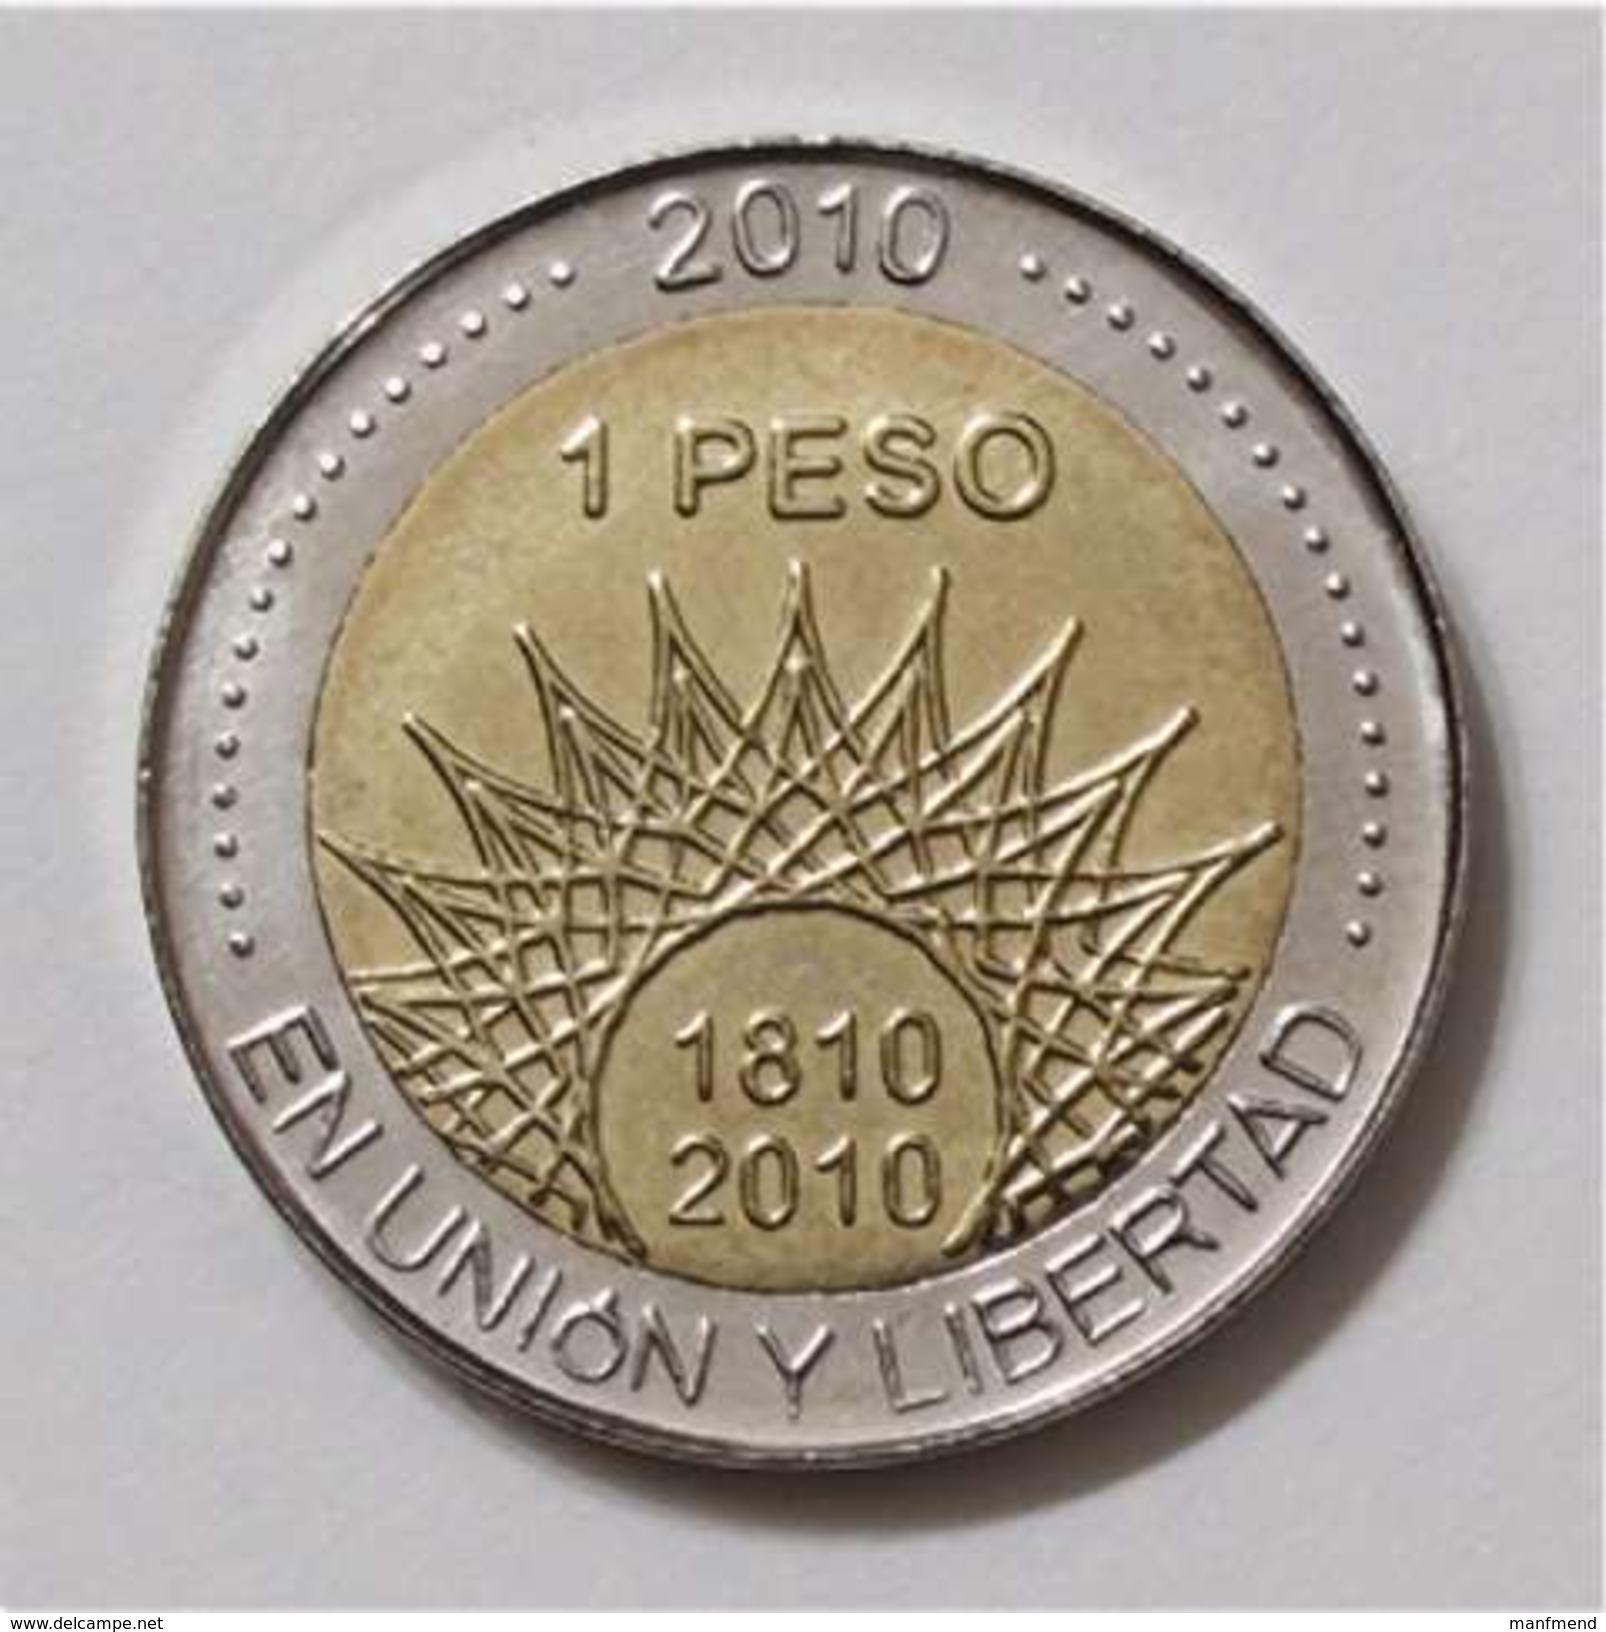 "Argentina - 2010 - 1 Peso - Bicentennial ""Pucara De Tilcara"" - KM 159 - Unc - Argentine"